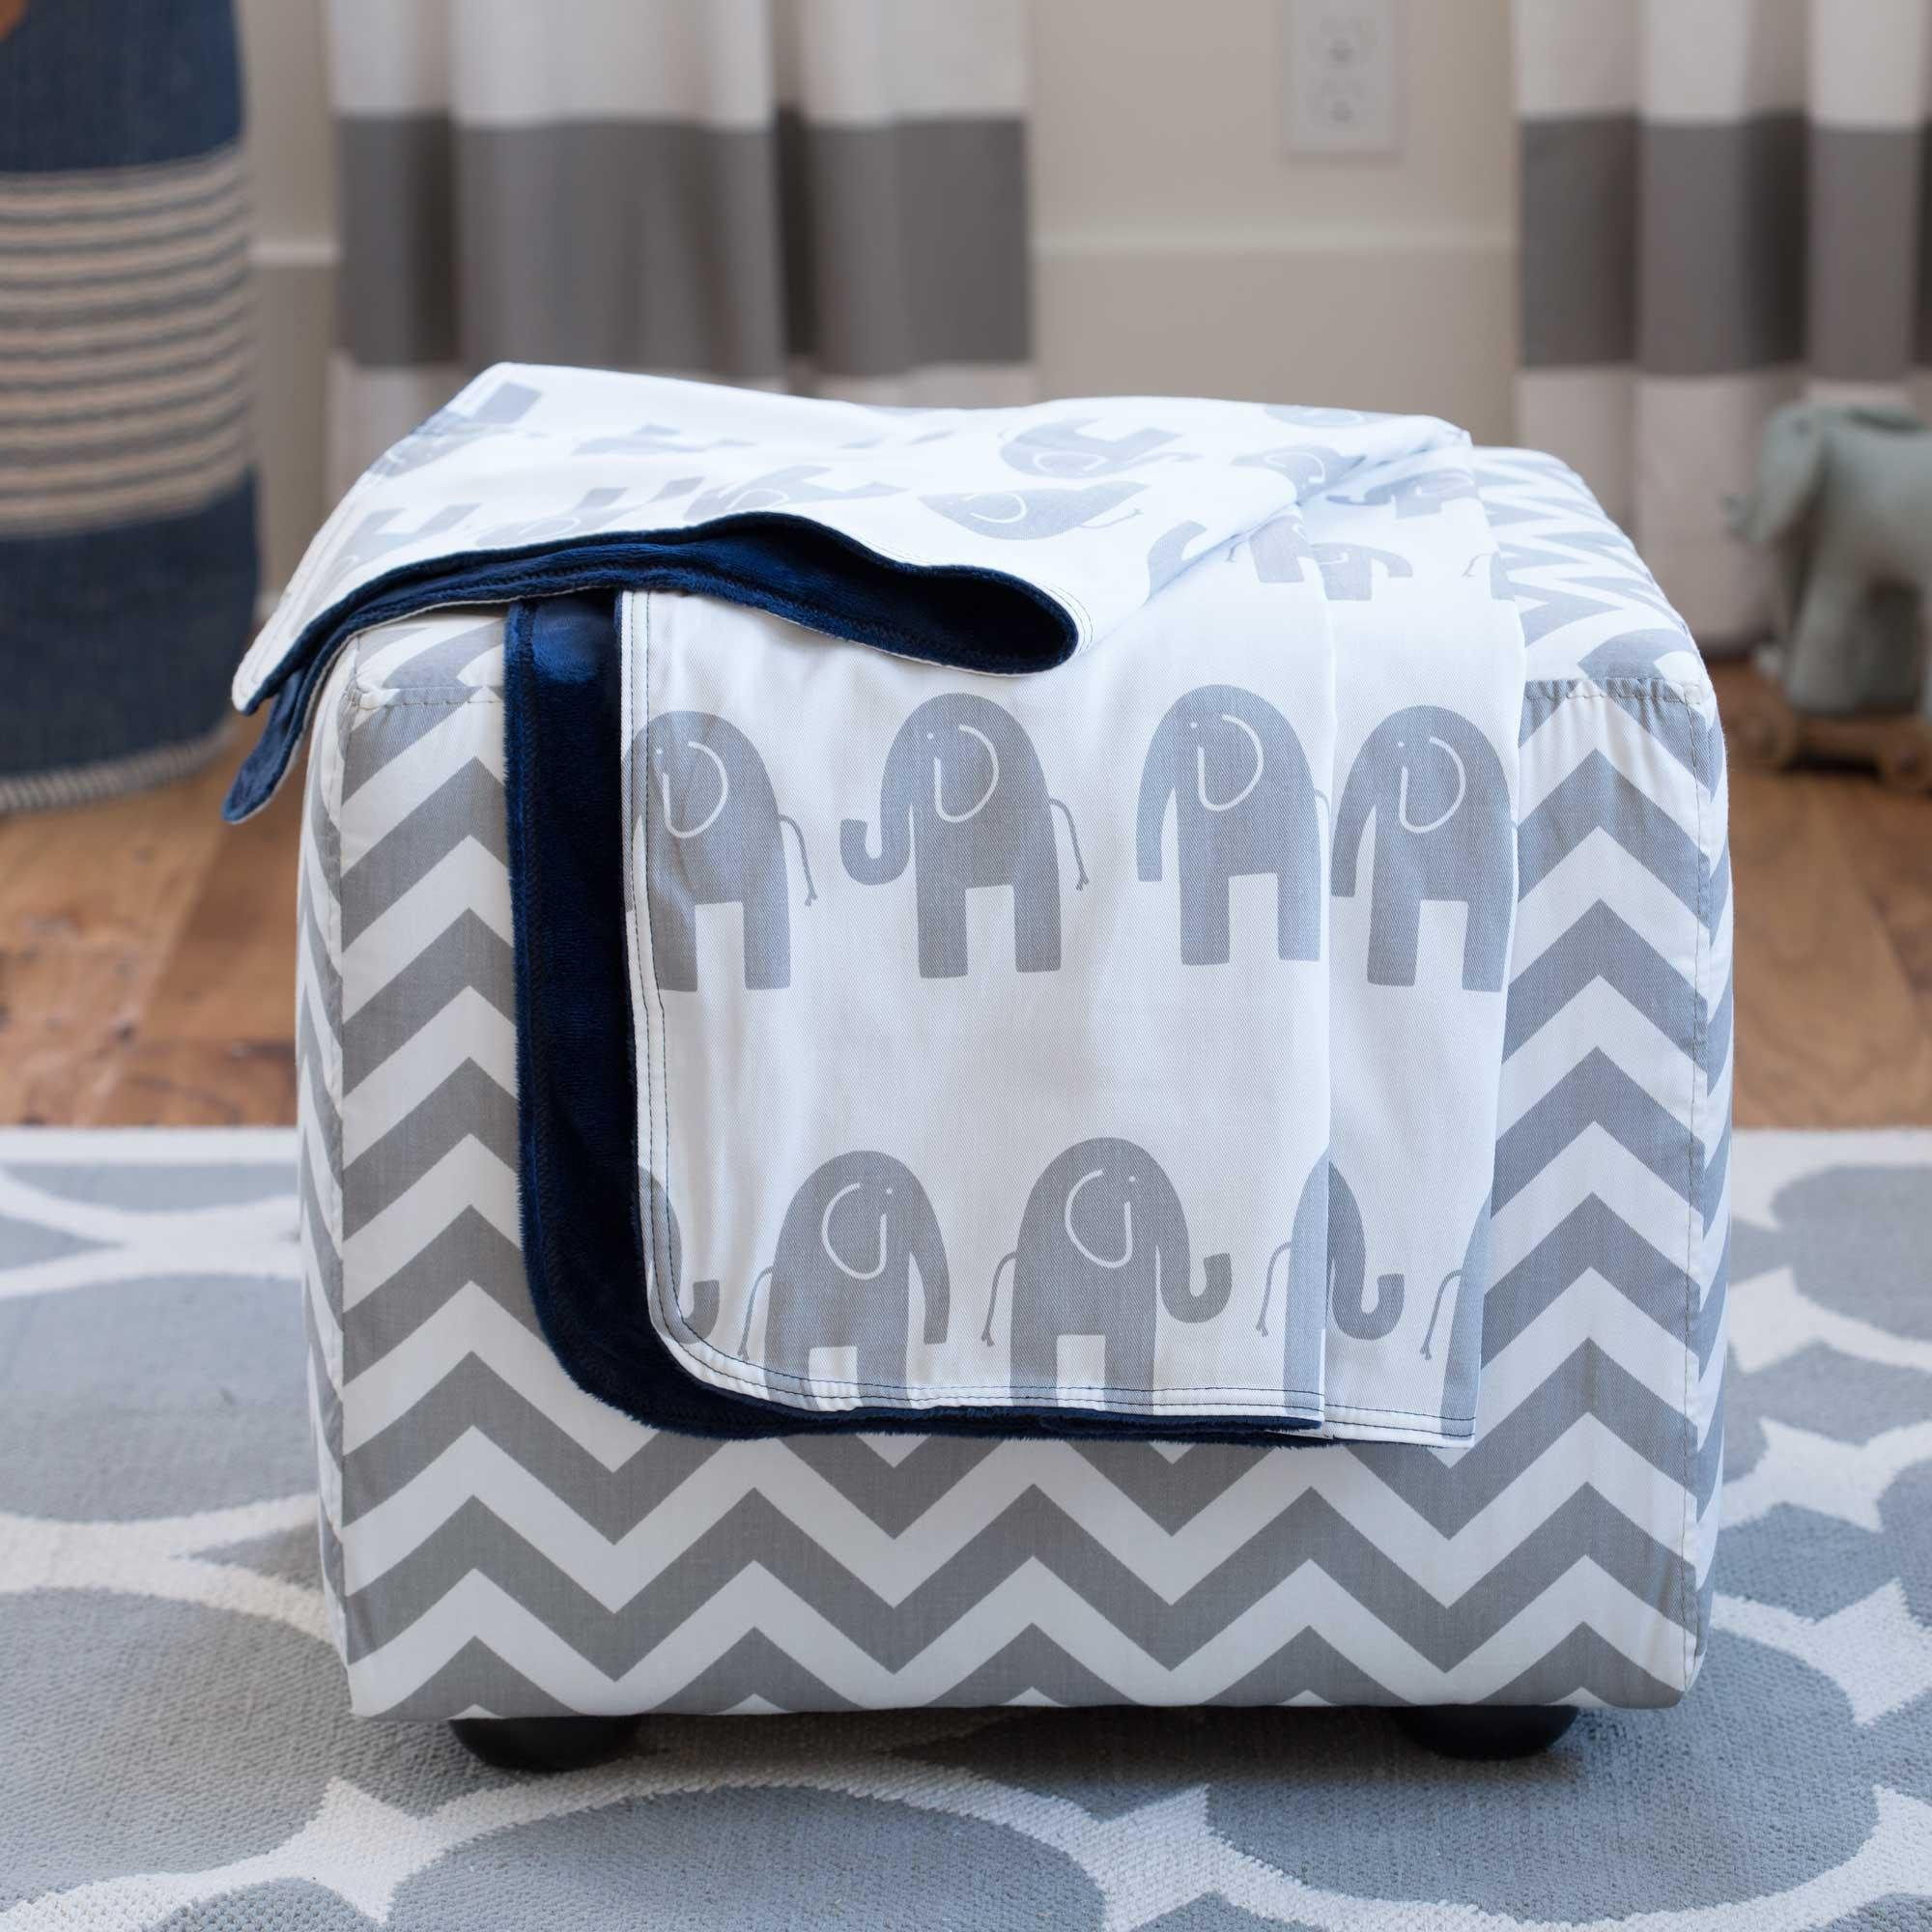 Carousel Designs Navy and Gray Elephants Crib Blanket